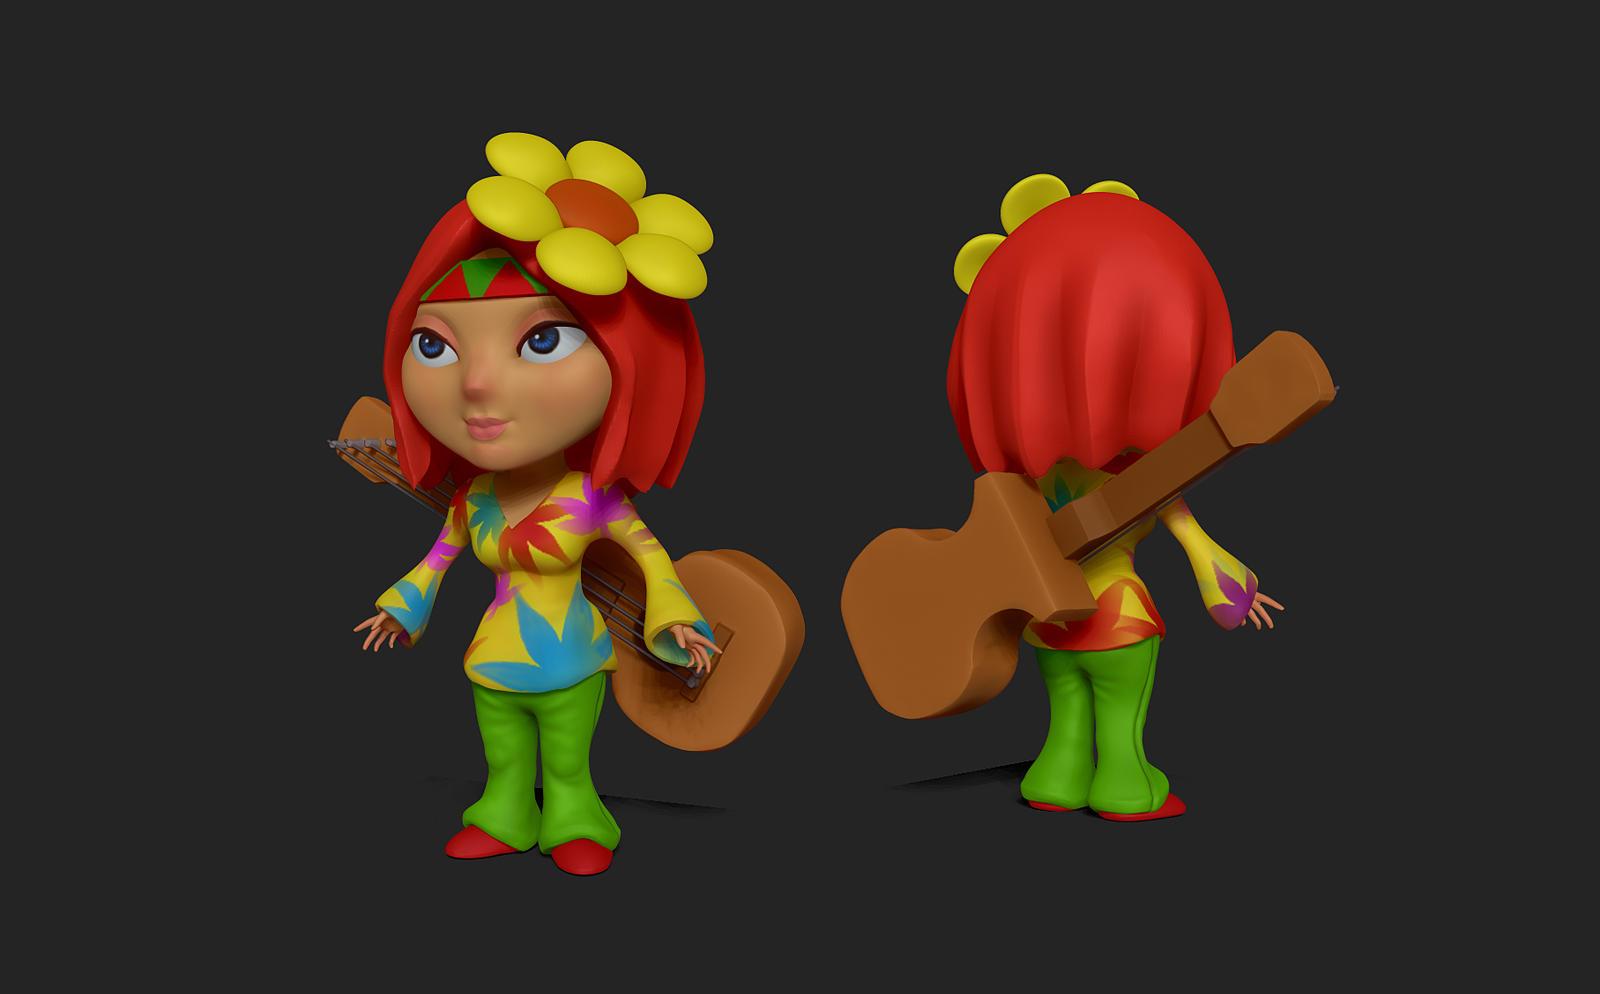 tulip___mobile_game_character_by_kabirtalib-d87mpar.jpg